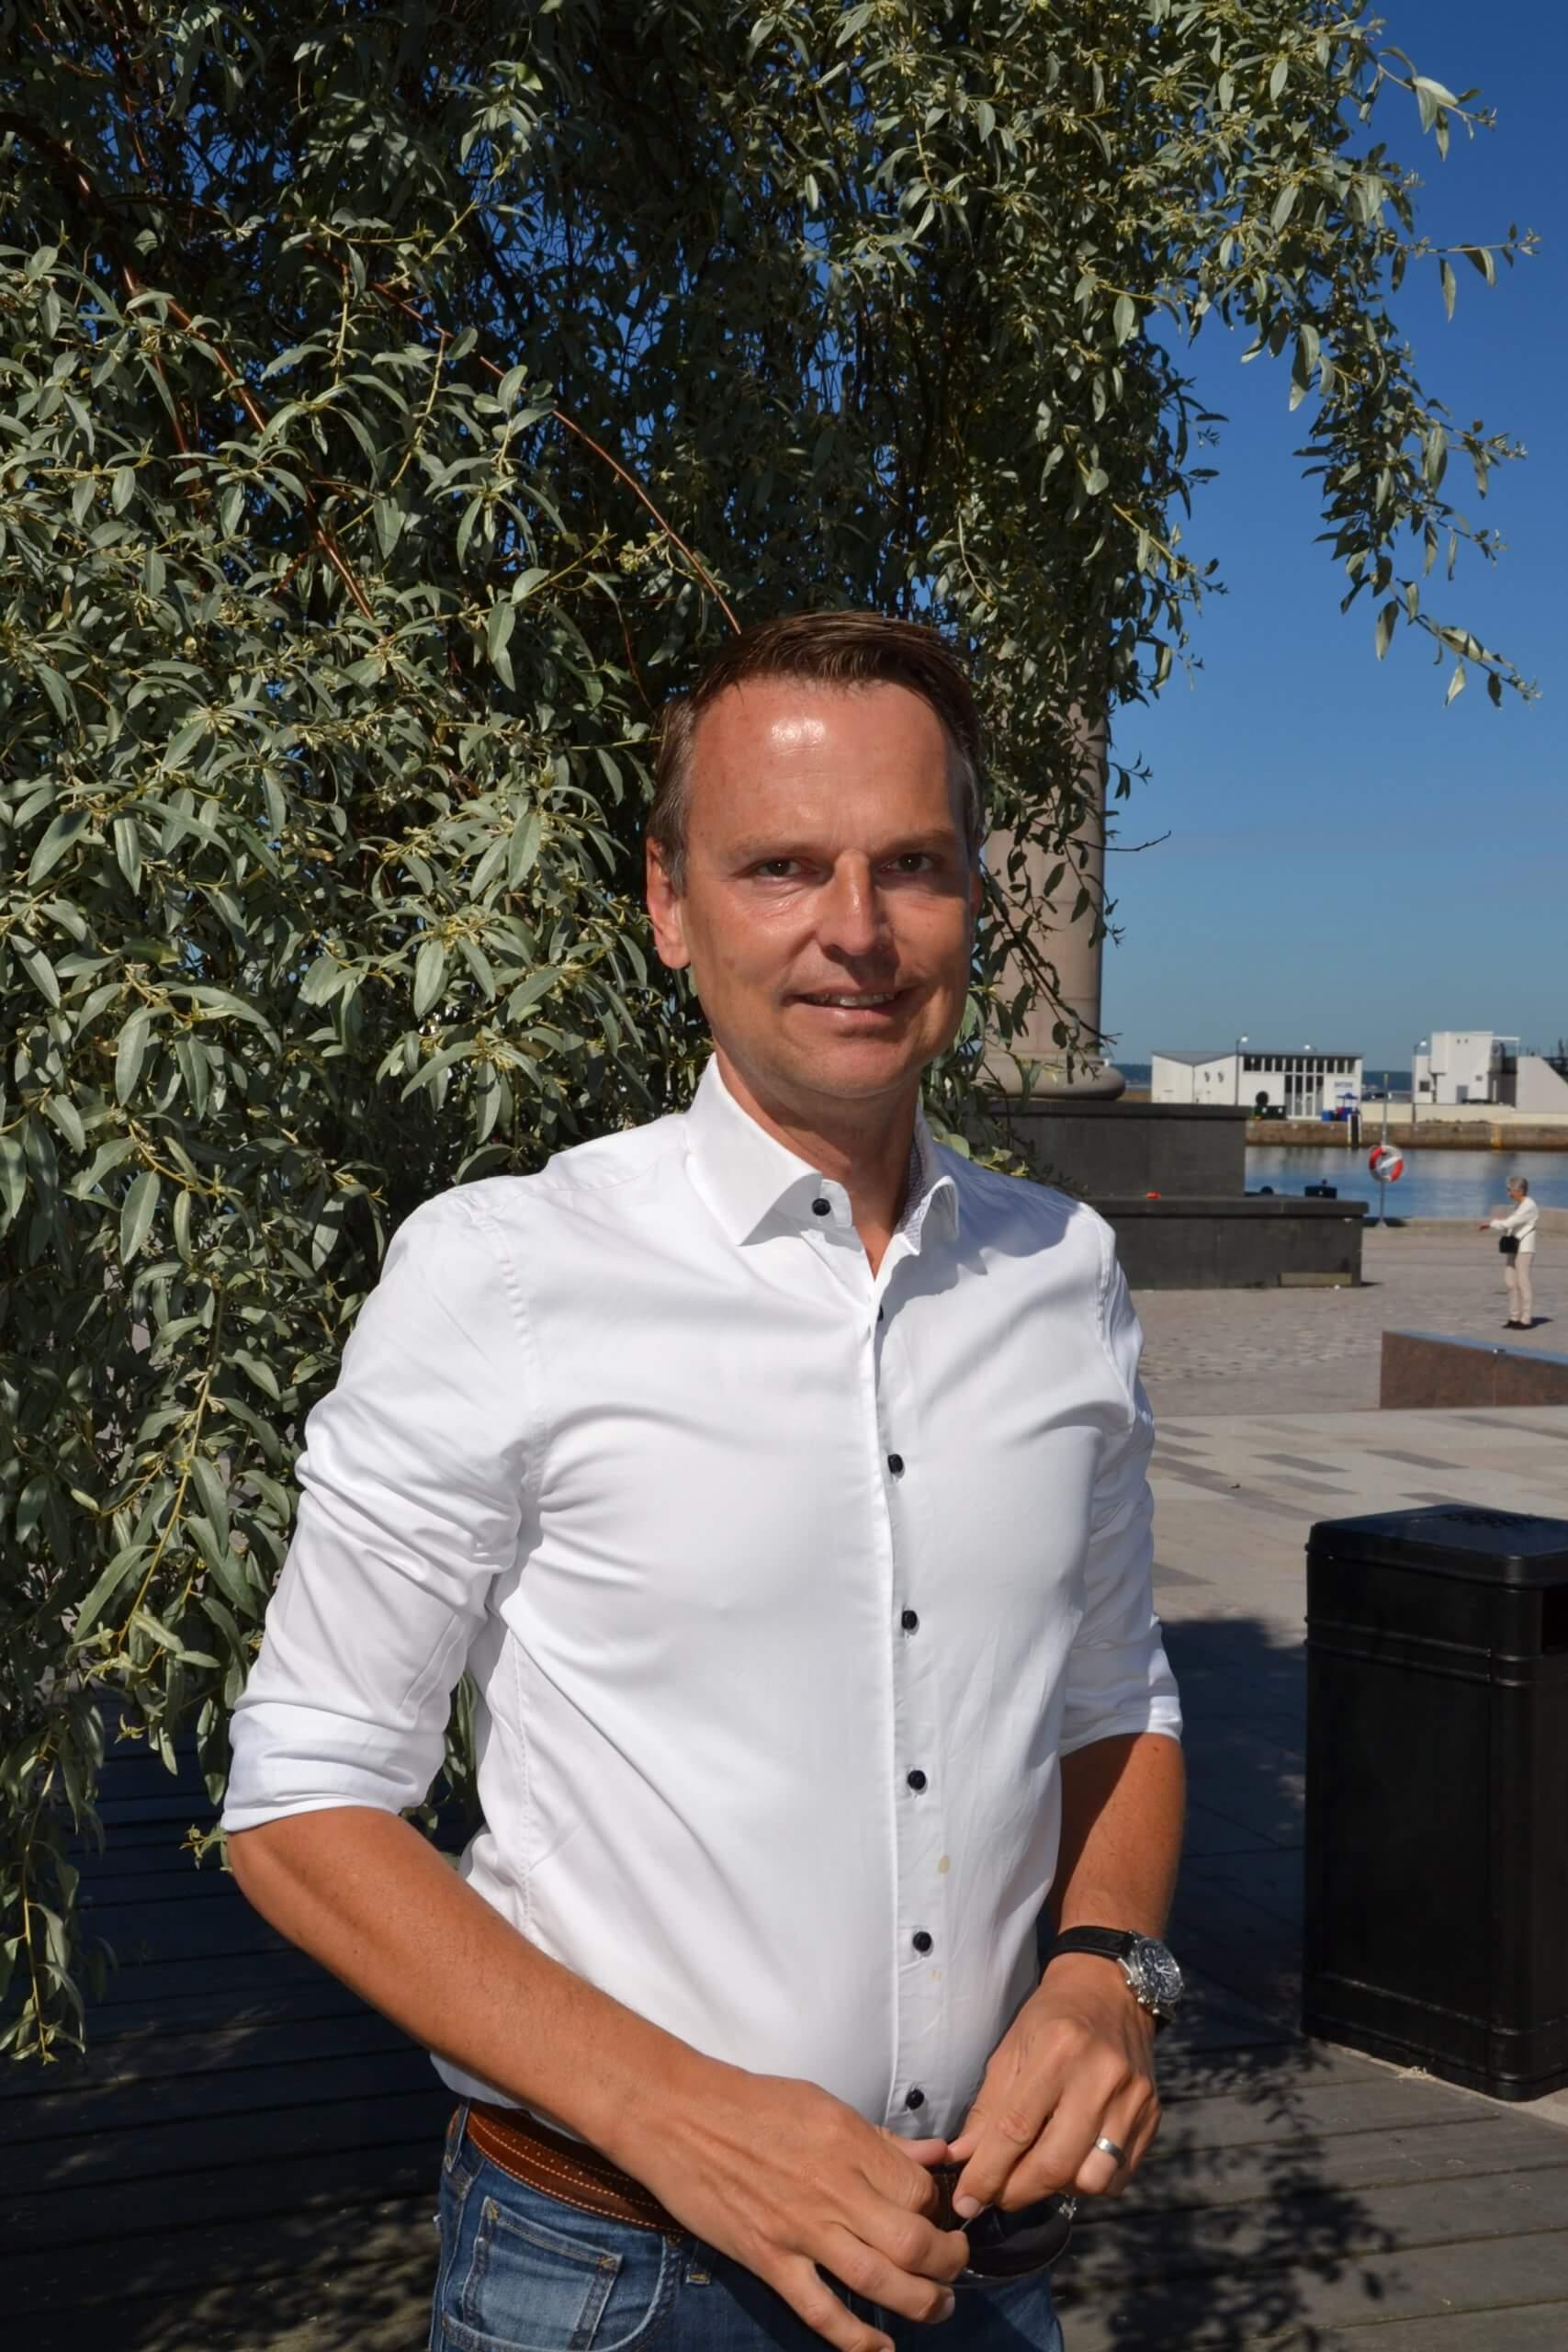 Peter Danielsson mayor of Helsingborg